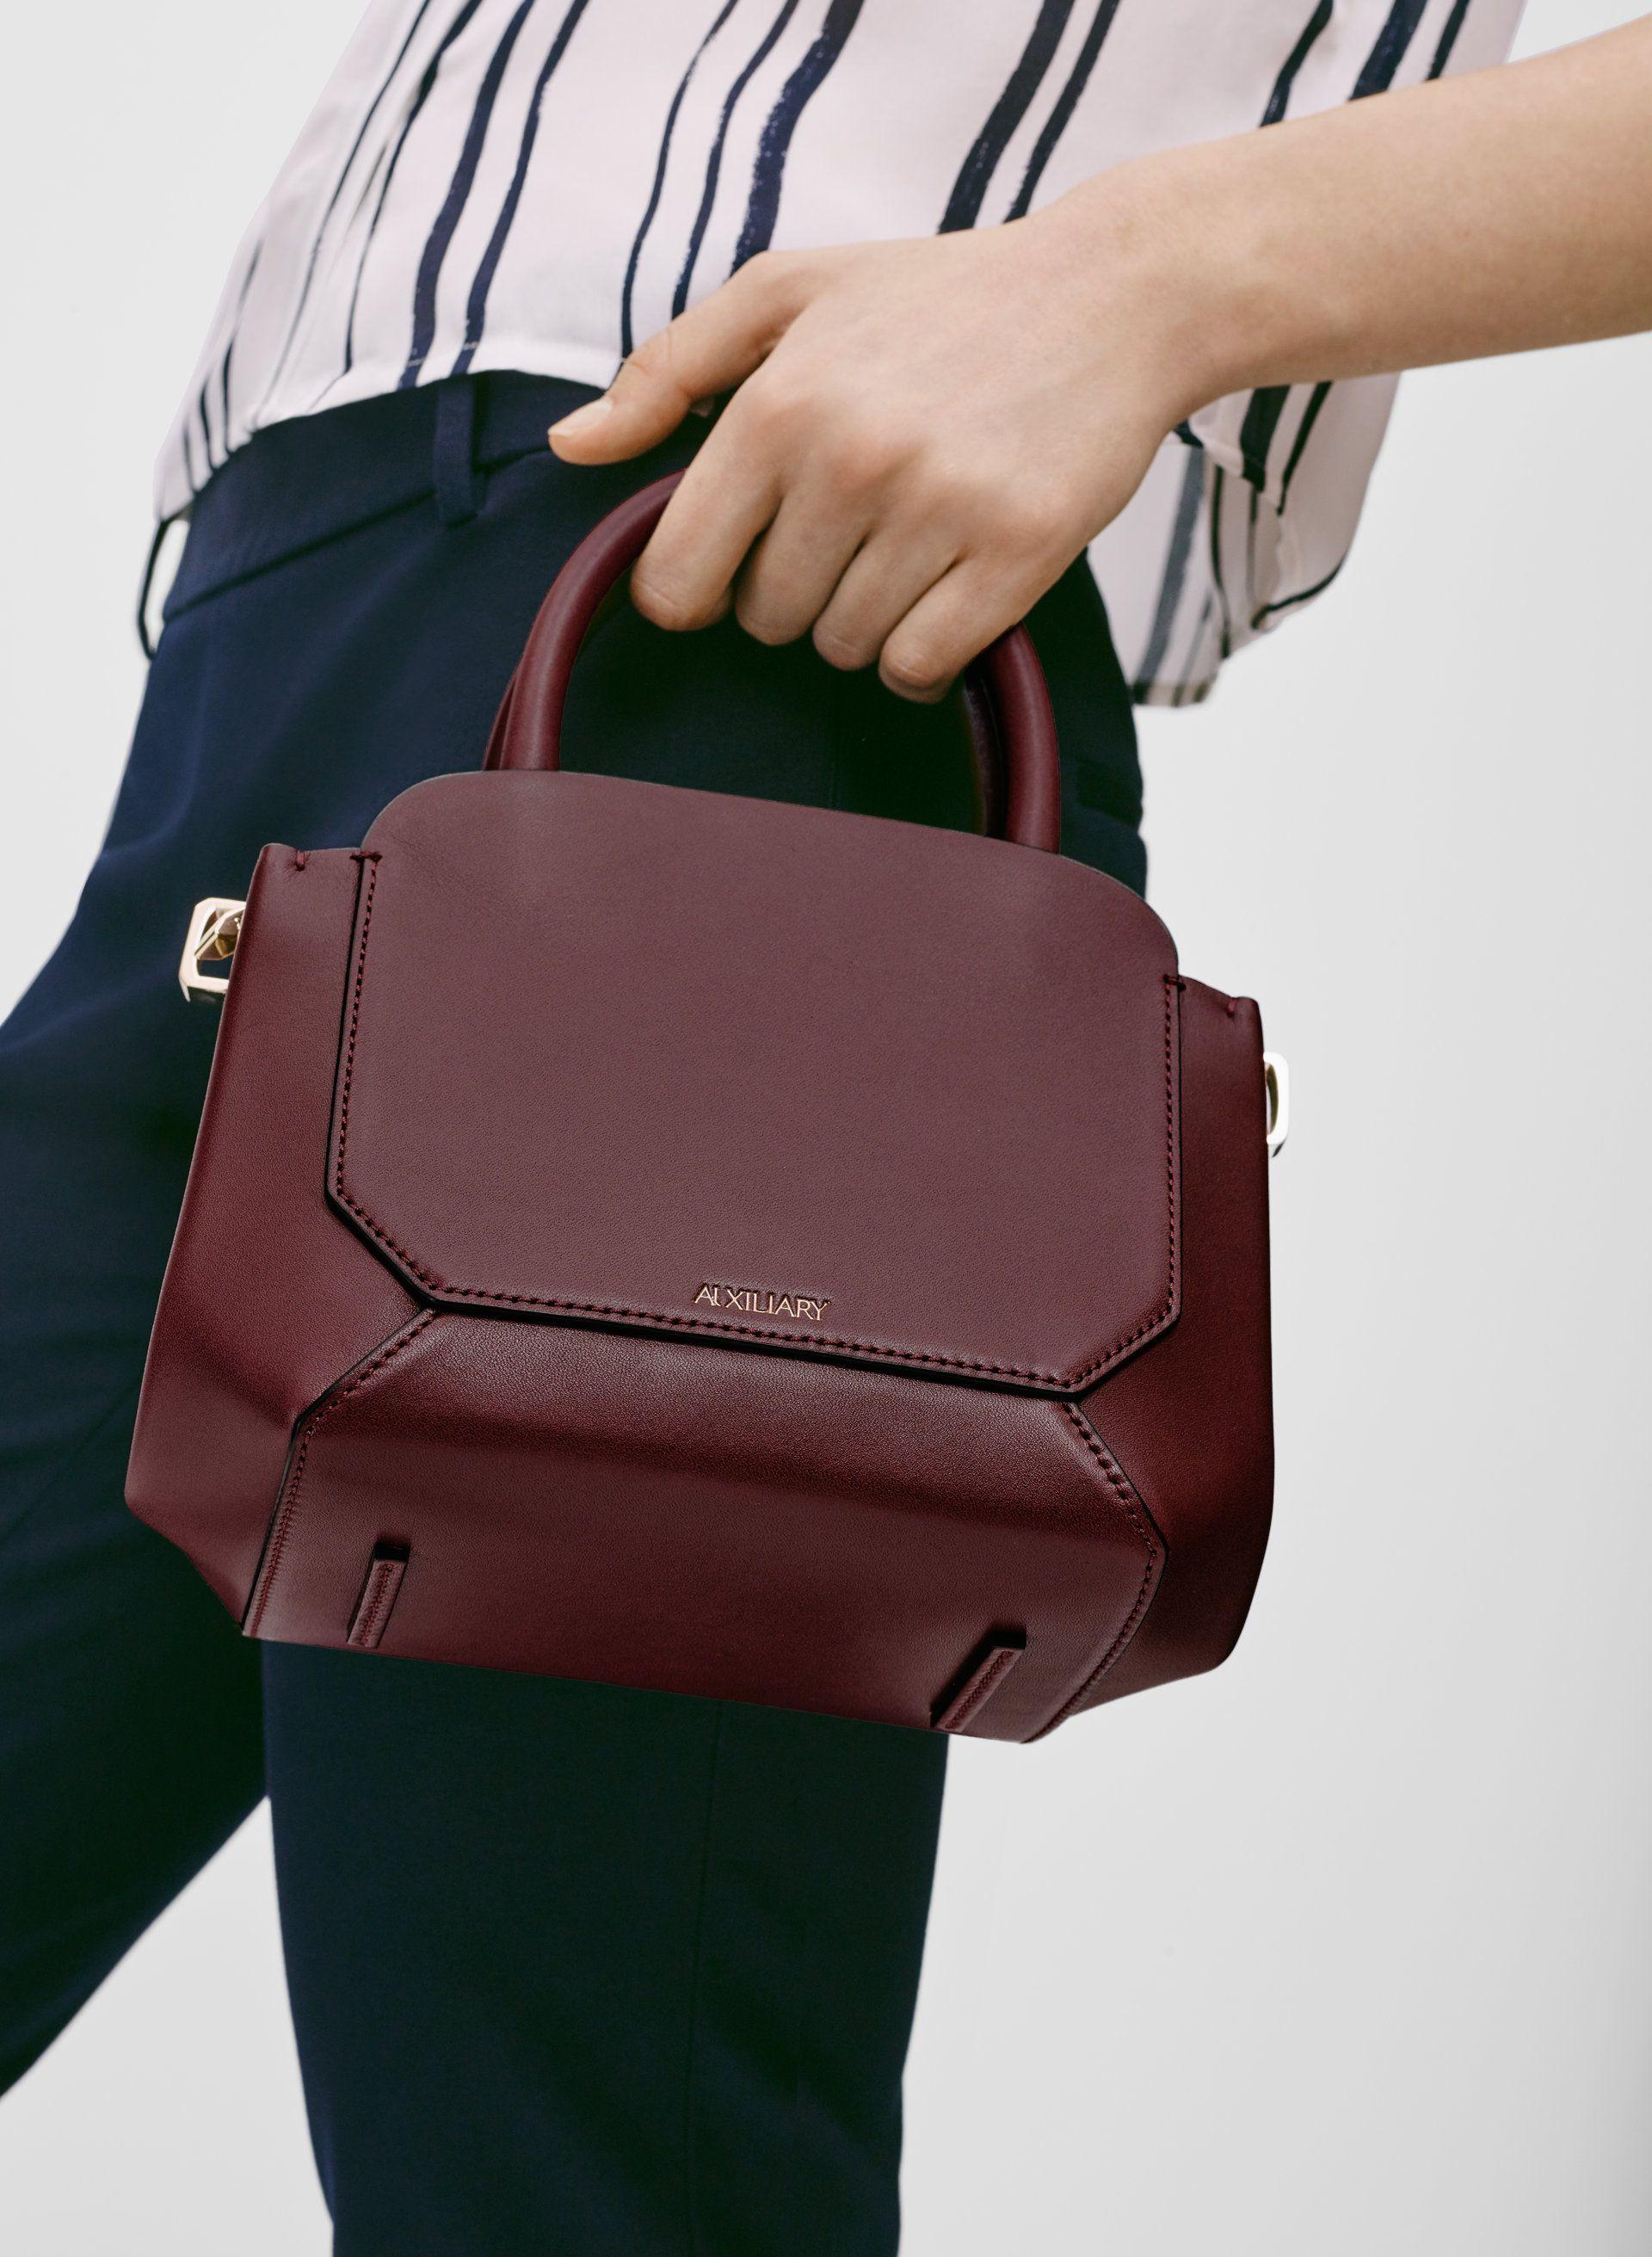 Mini bega satchel bag | Satchels, Minis and Bag